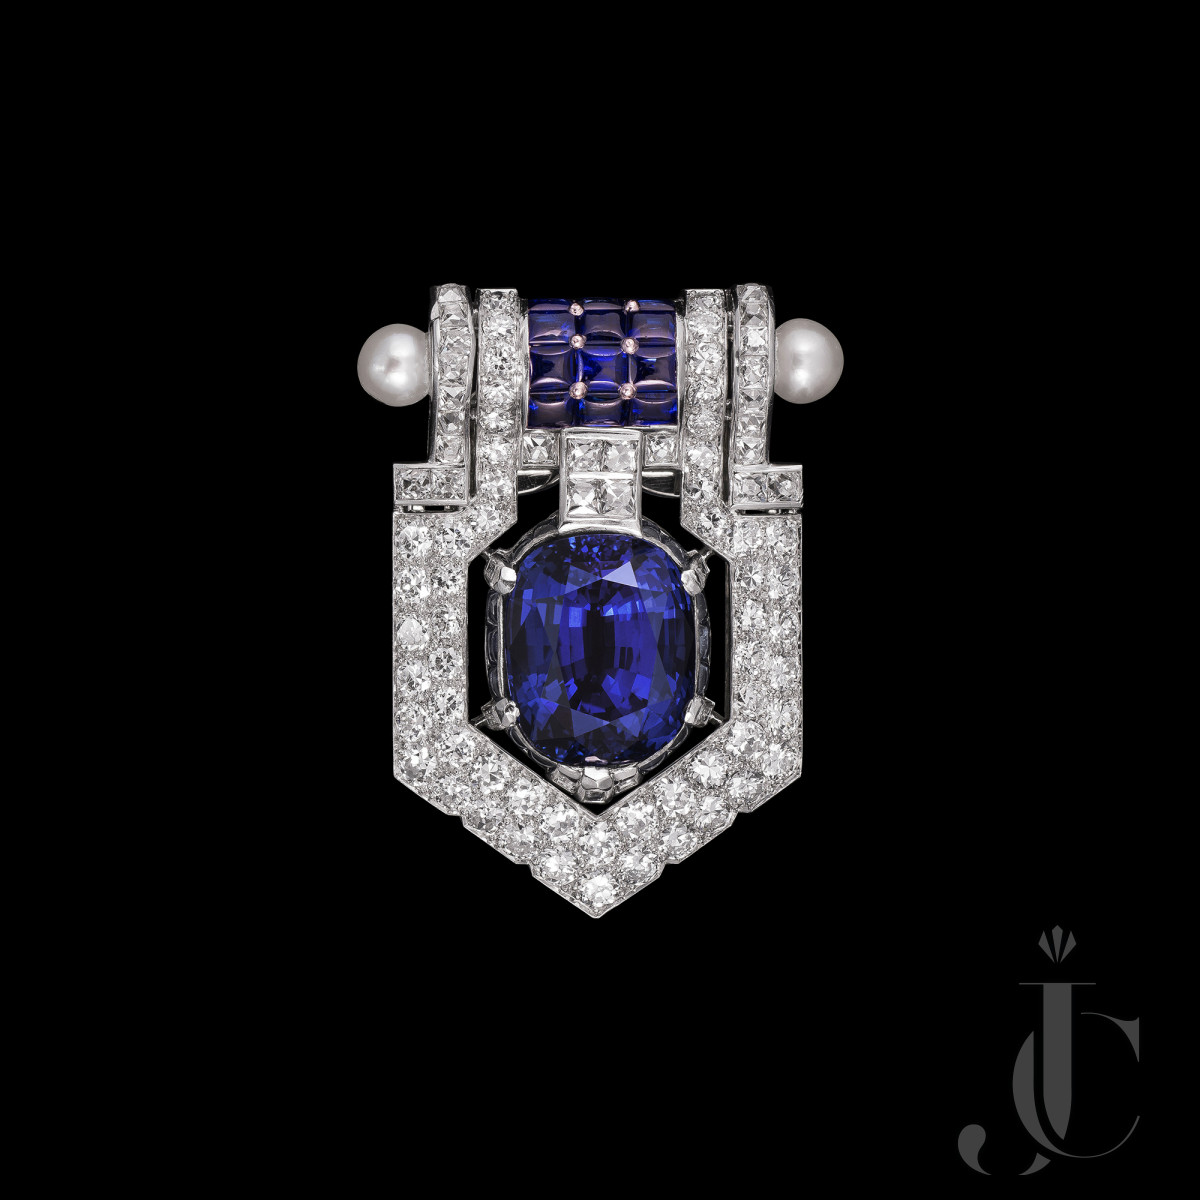 Over 20 cts Unheated Sri Lankan Sapphire Diamond Brooch from Cartier